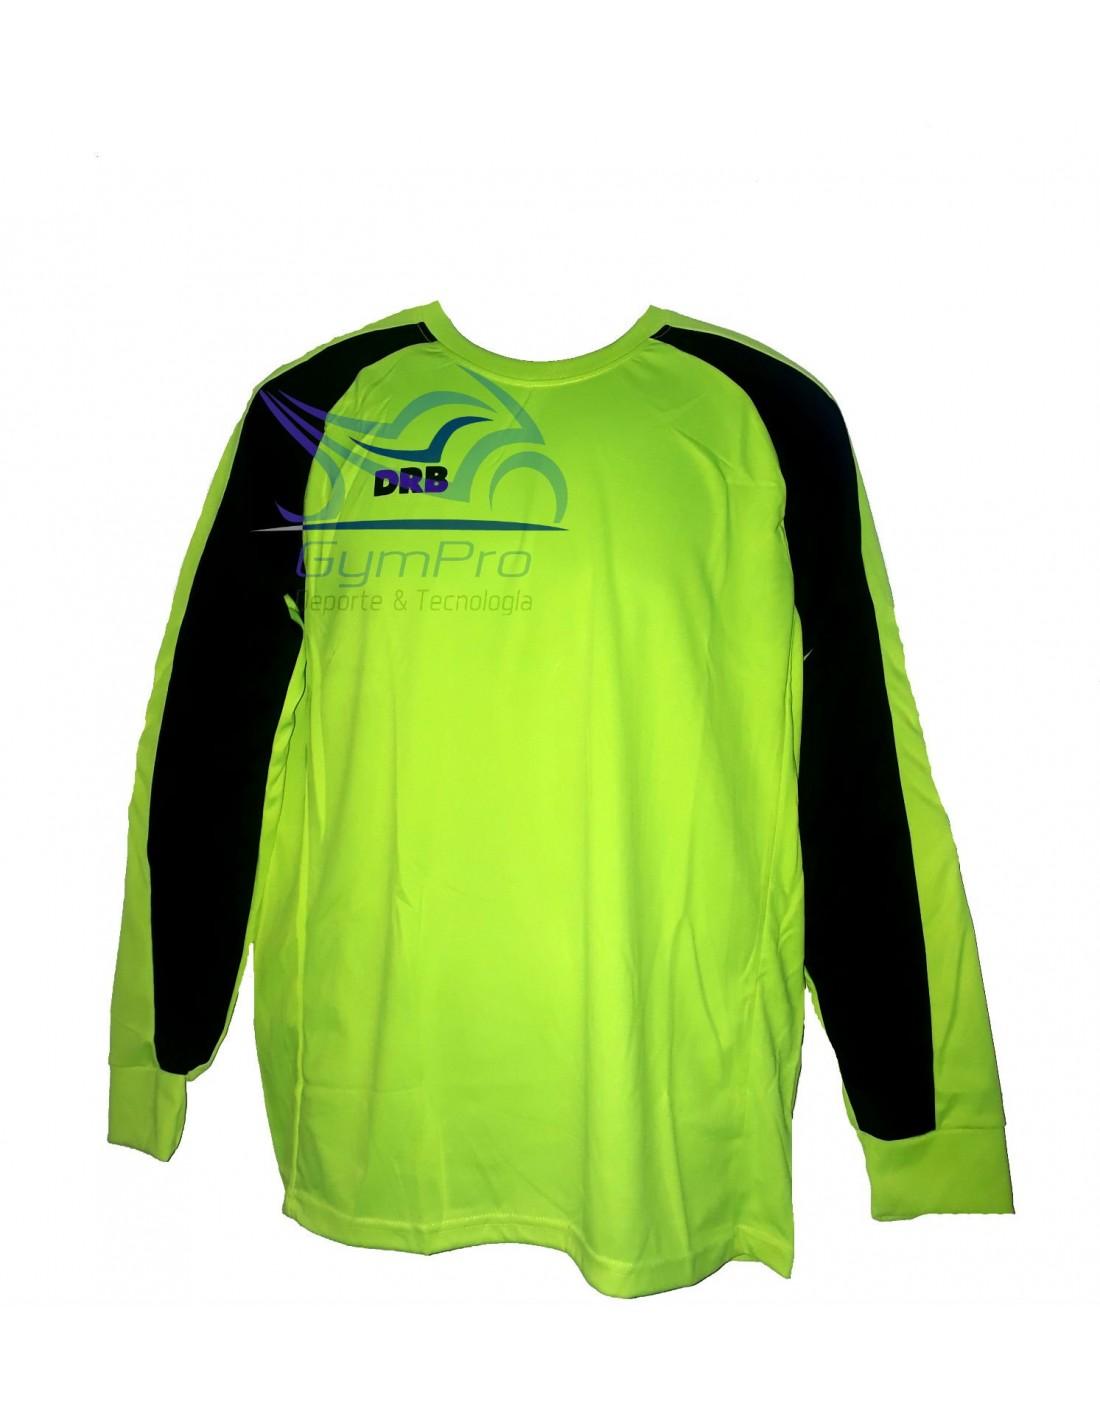 Ropa de fútbol - Ropa Arquero - Camisetas Arquero - Fútbo l GymPro.cl 8214530be0892